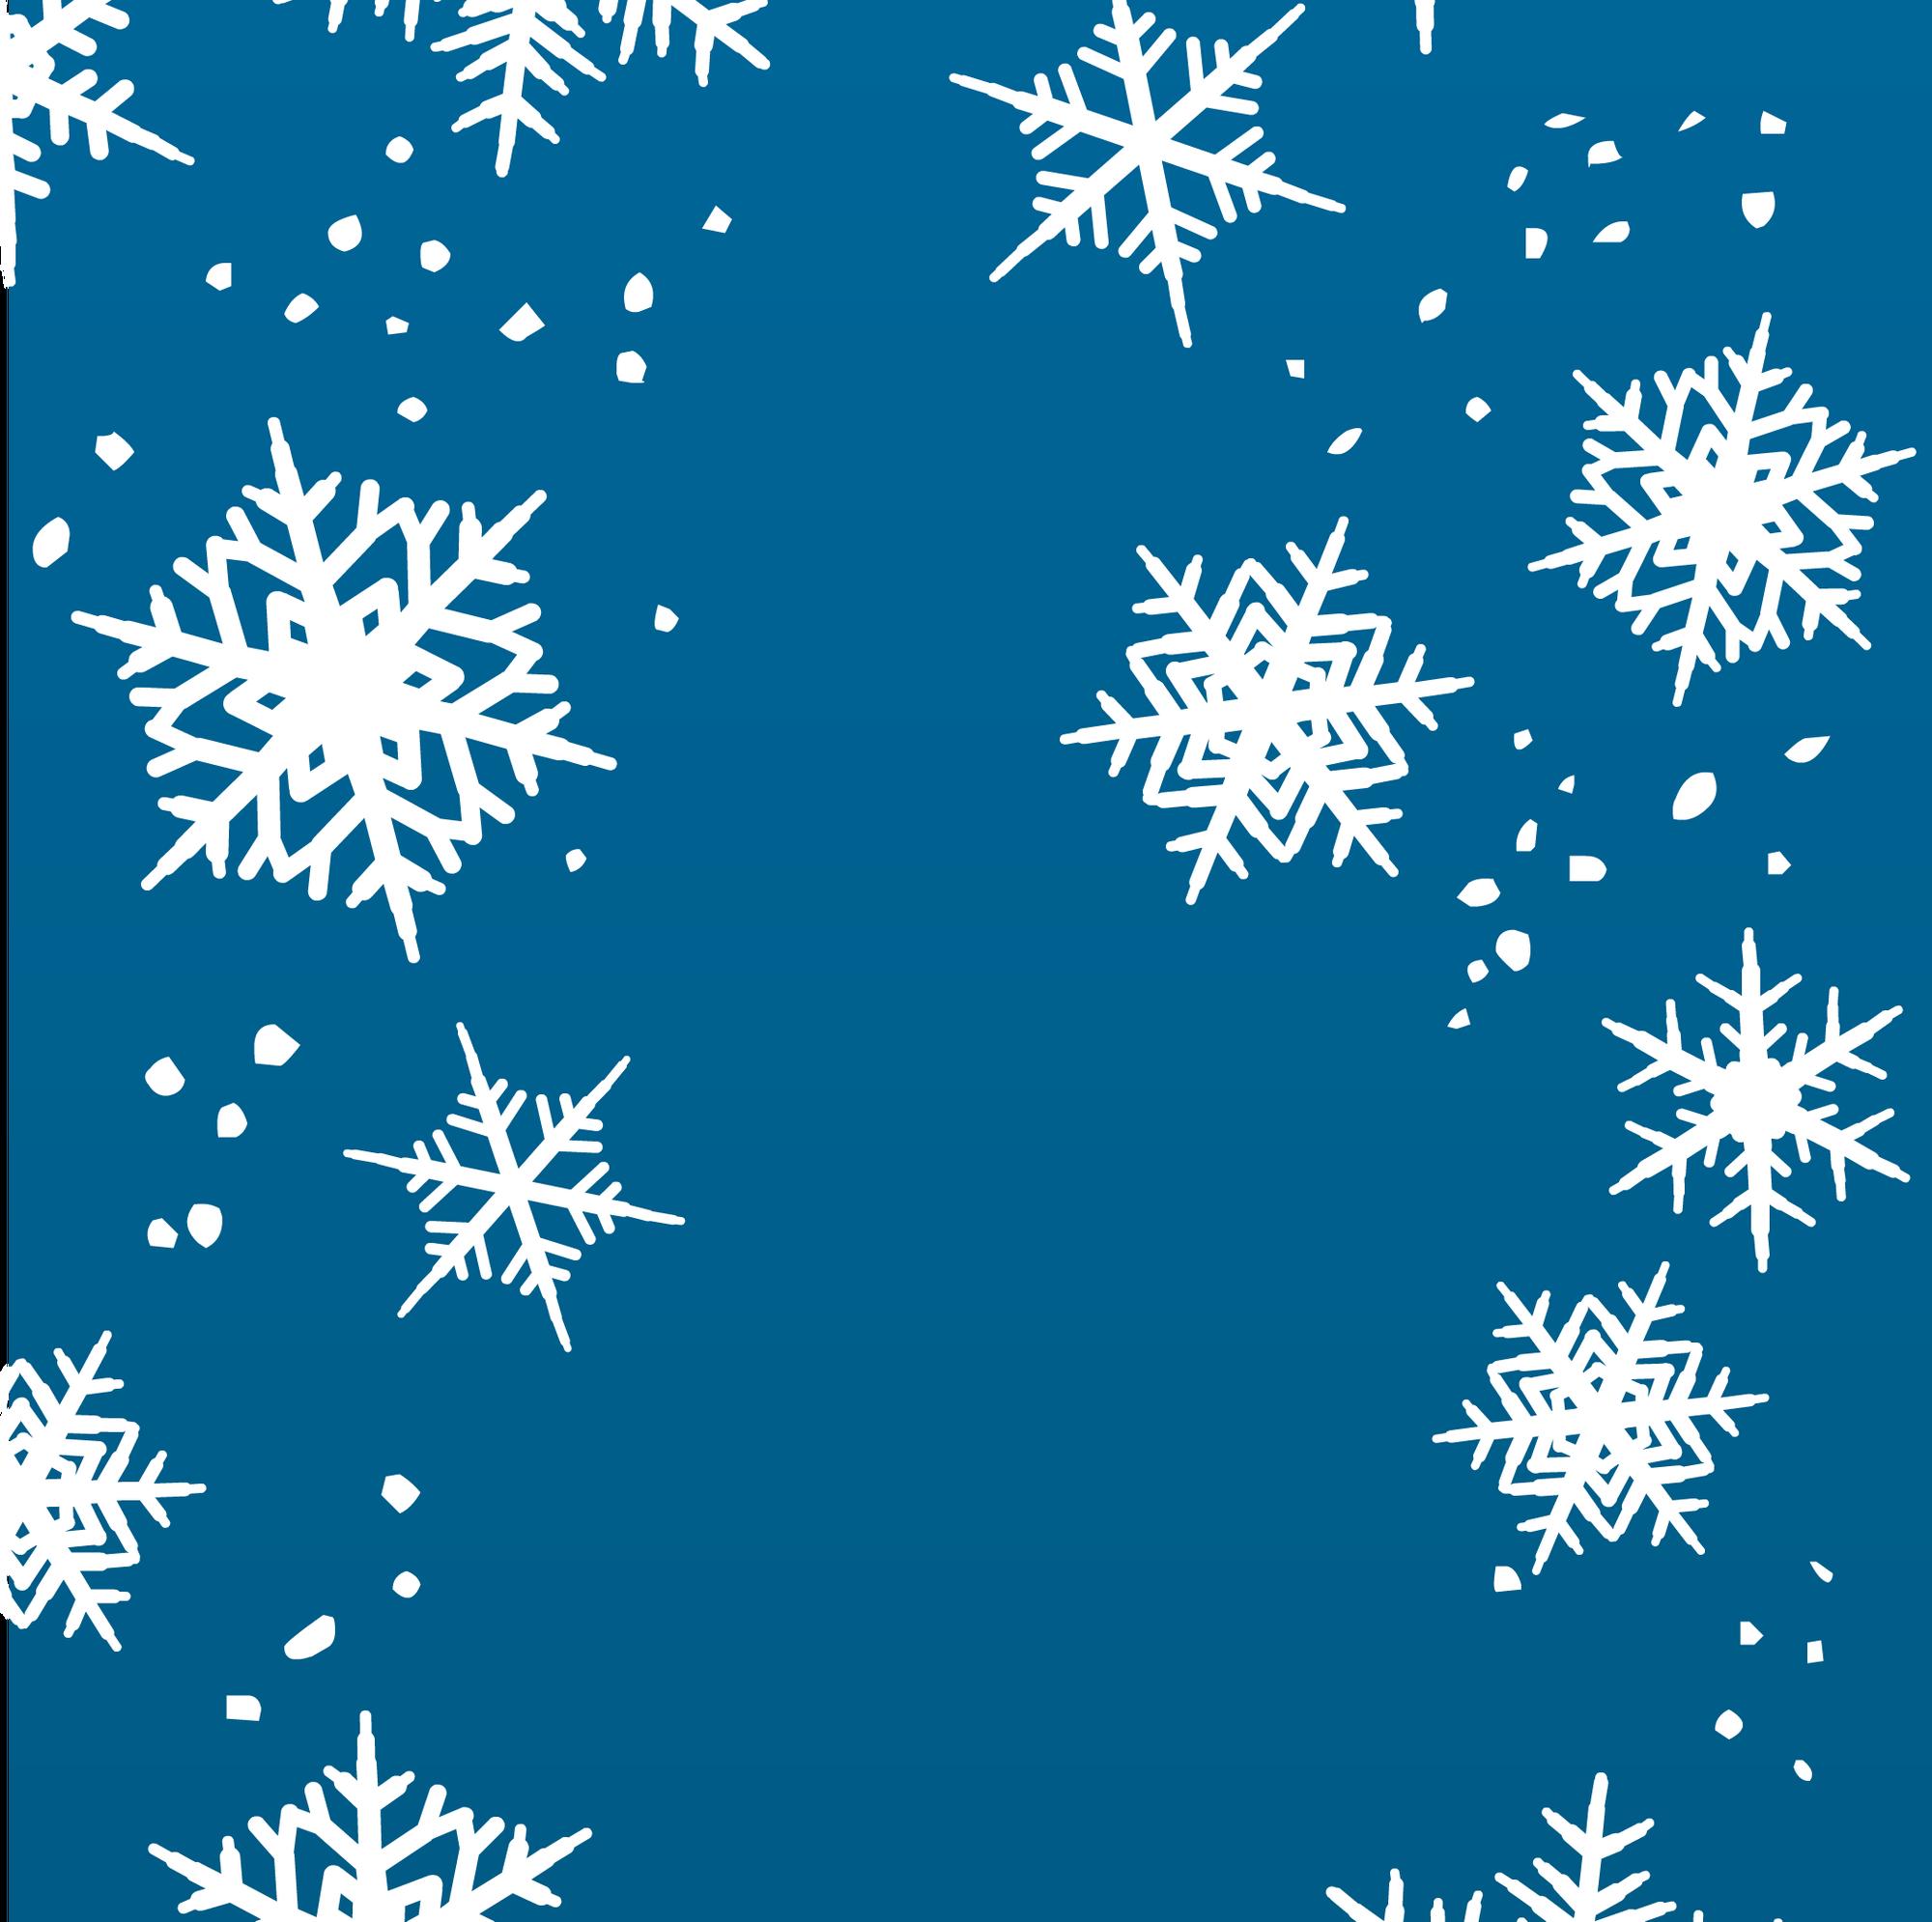 Snowflakes Background (ID 935)